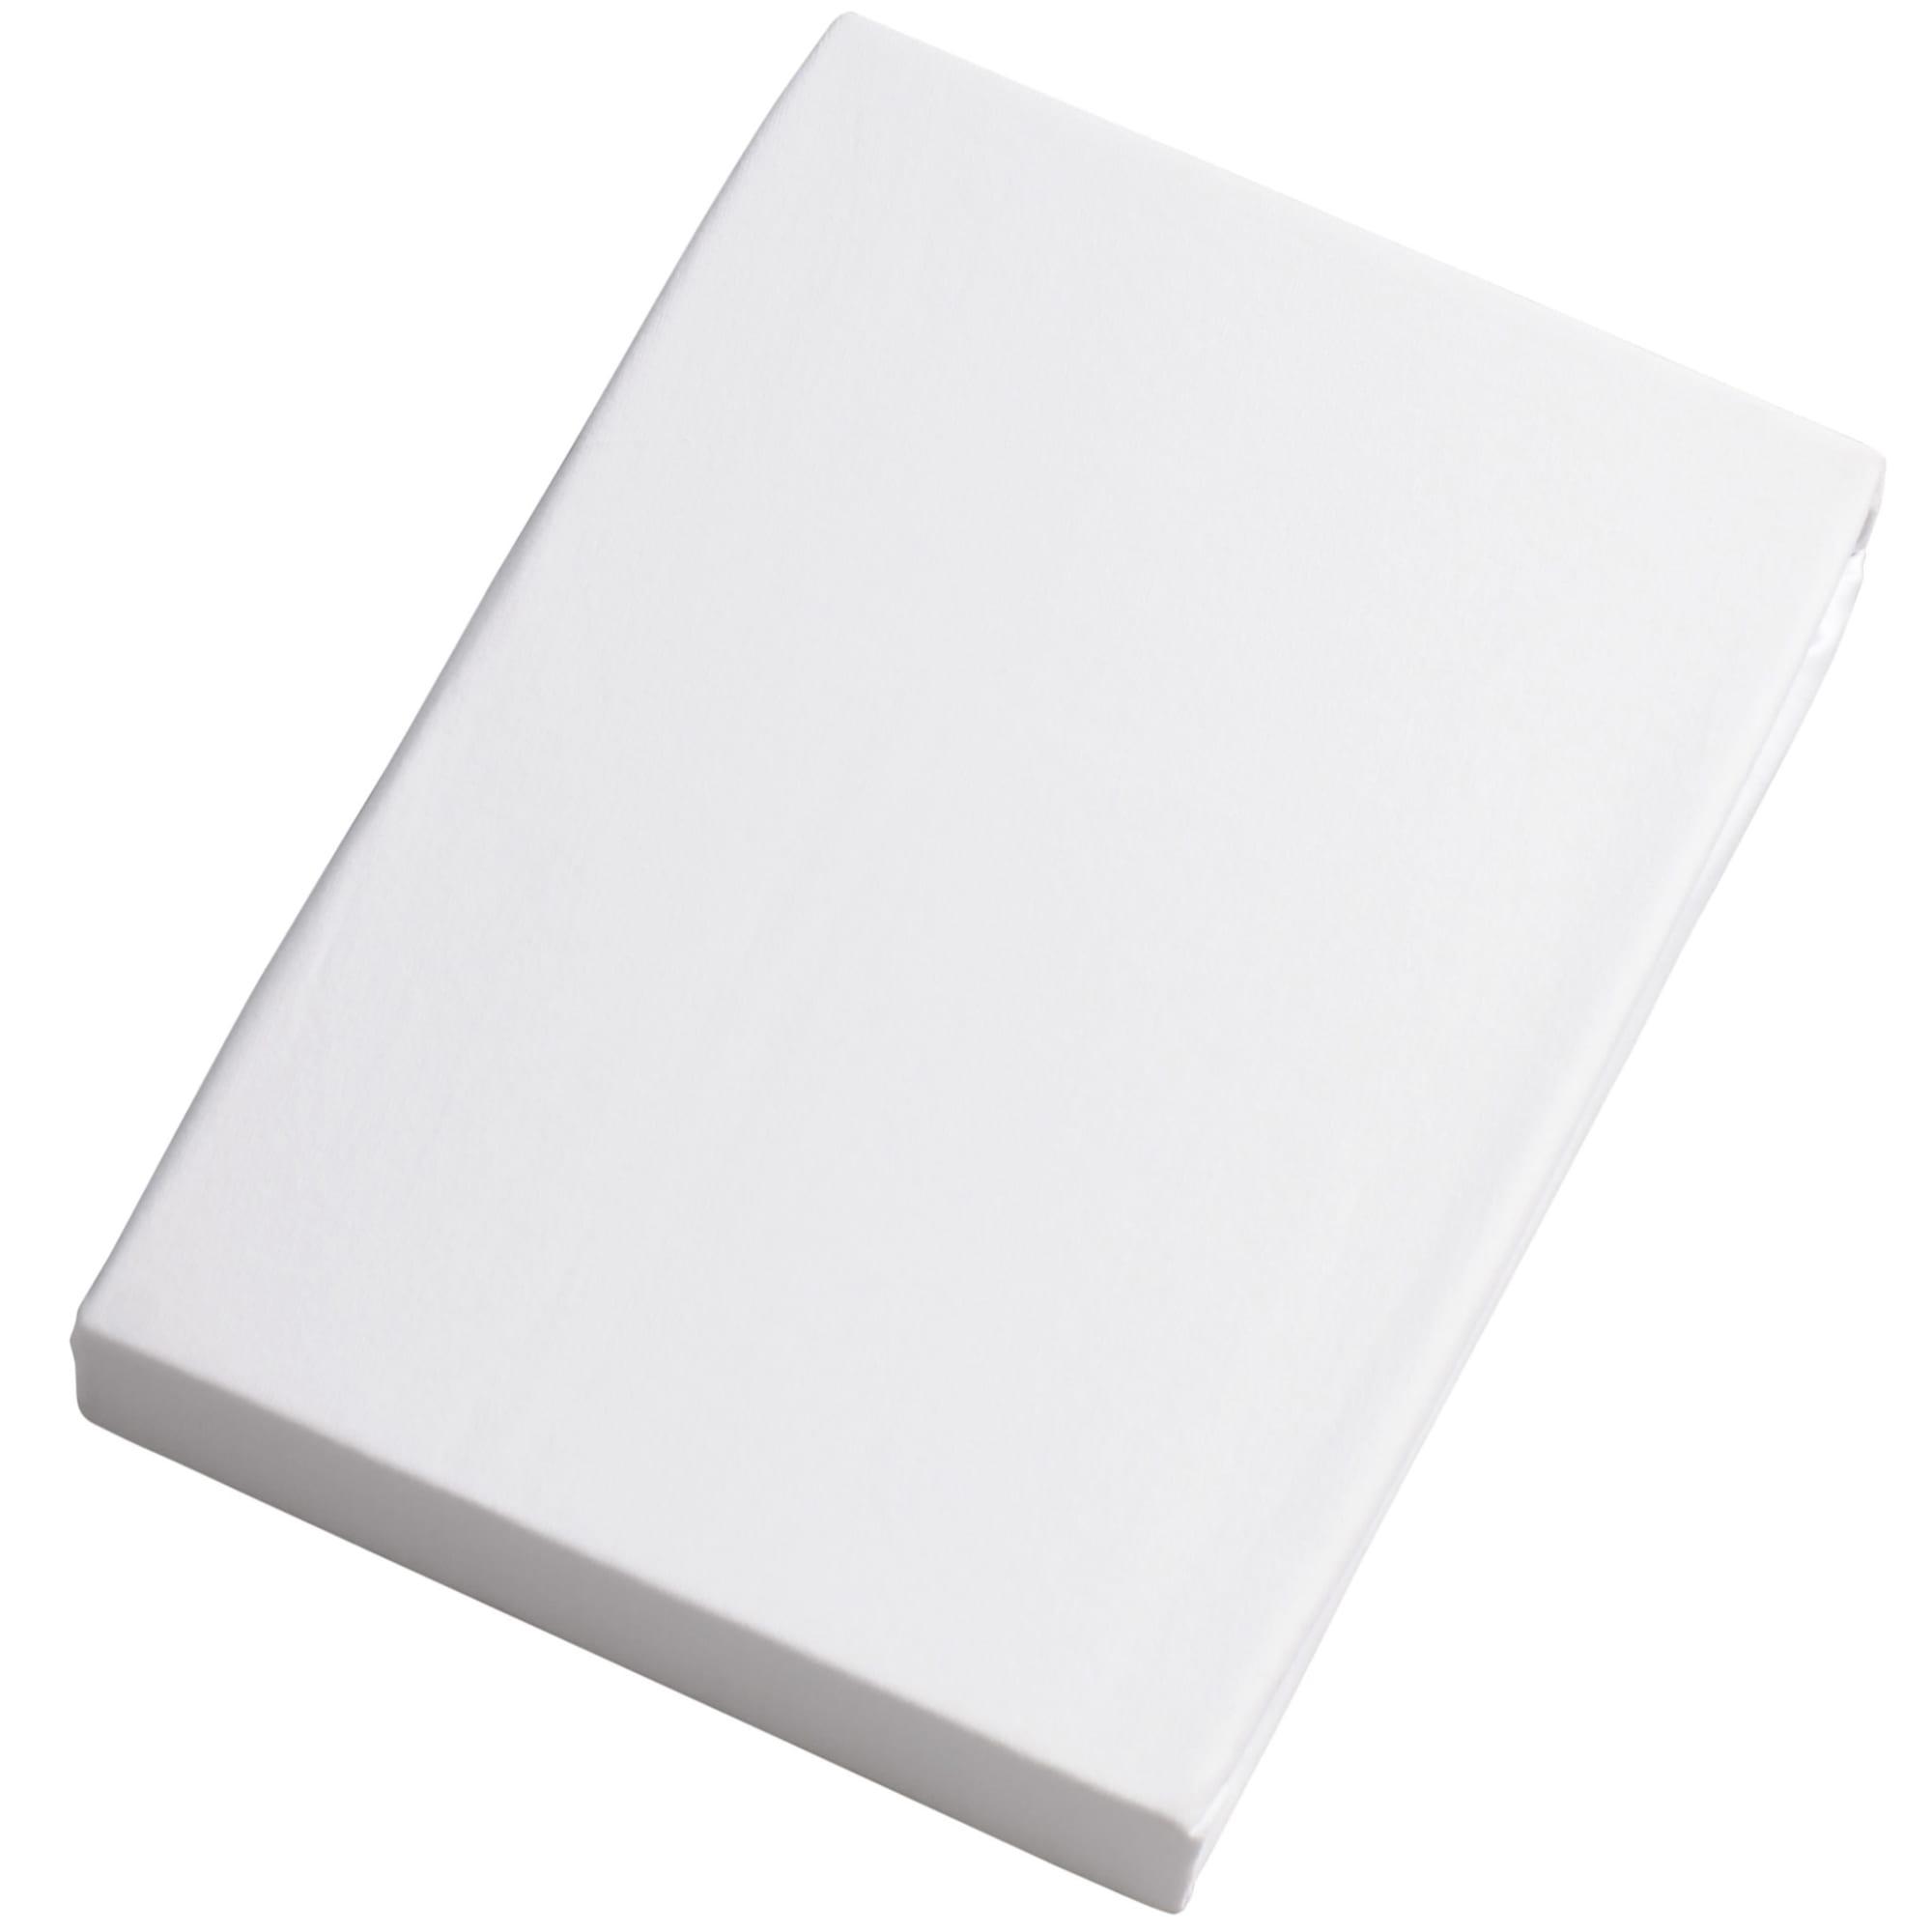 Bomuld/elastan - 60 x 120 cm